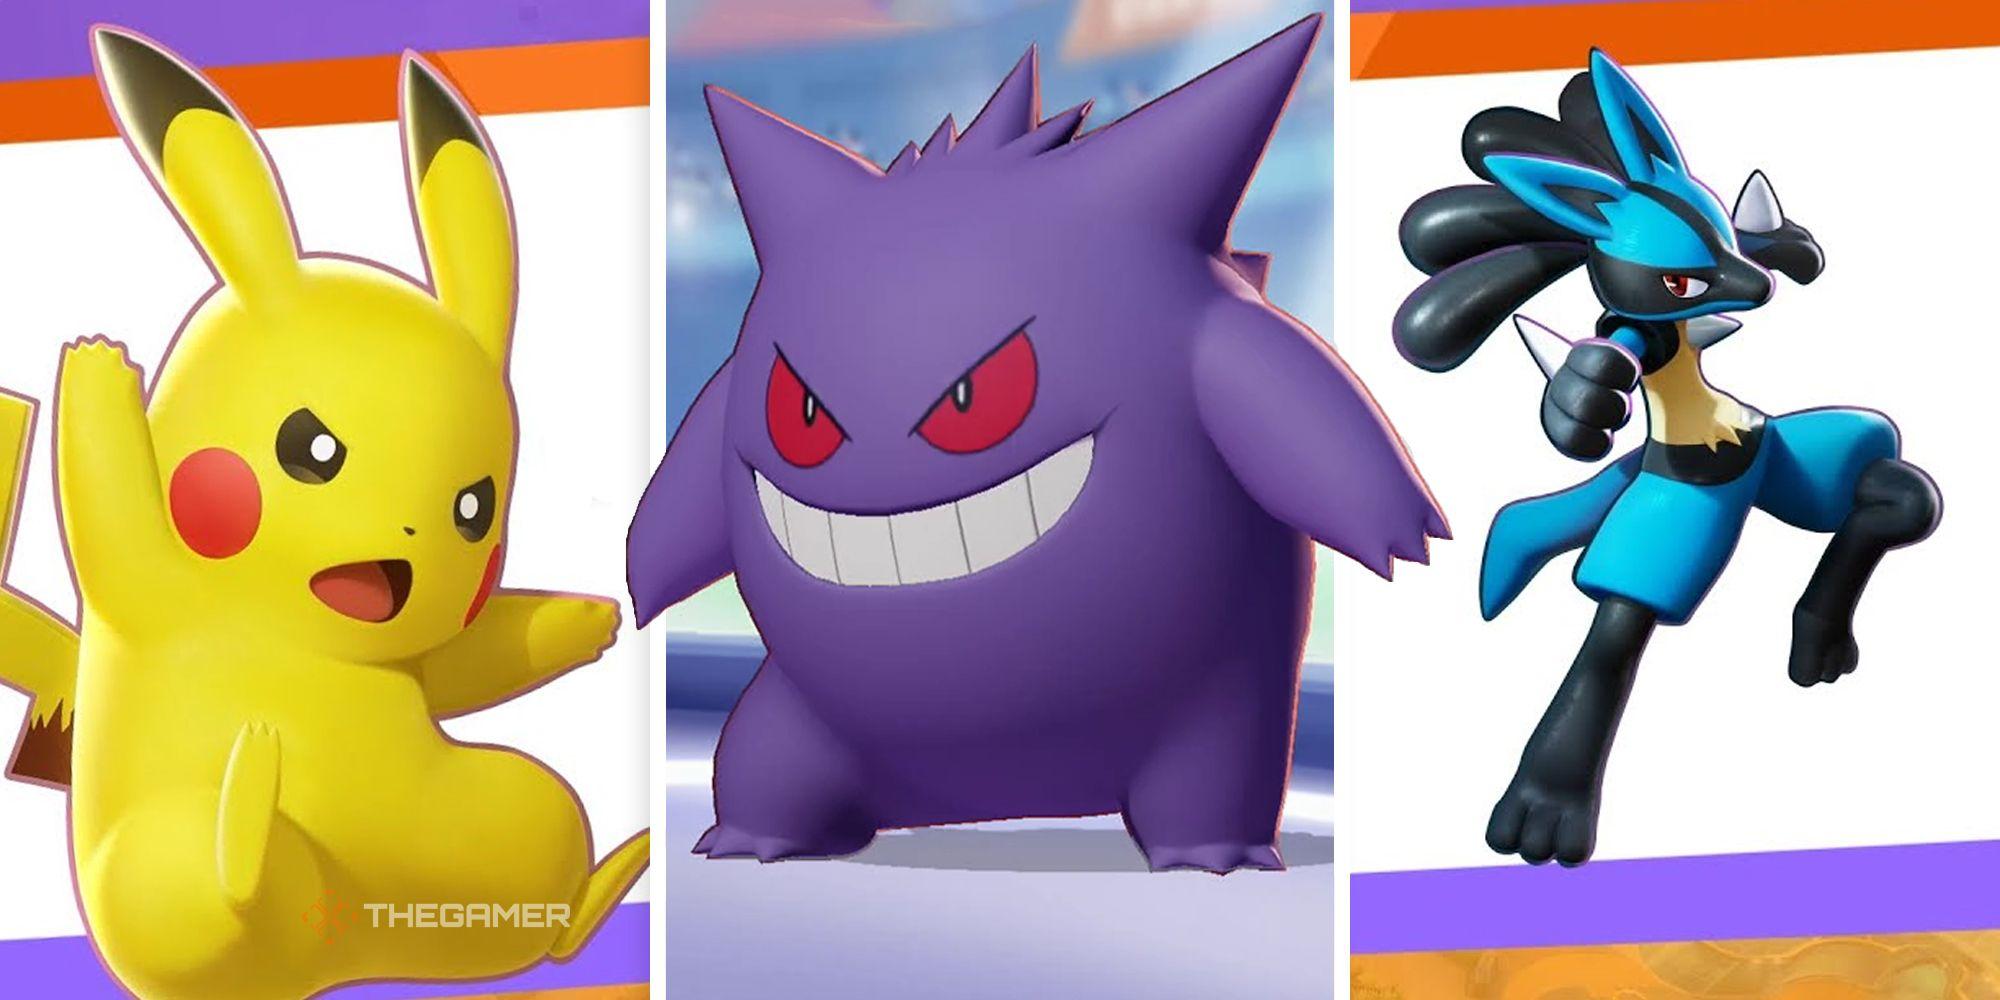 Guía de roles de Pokémon Unite